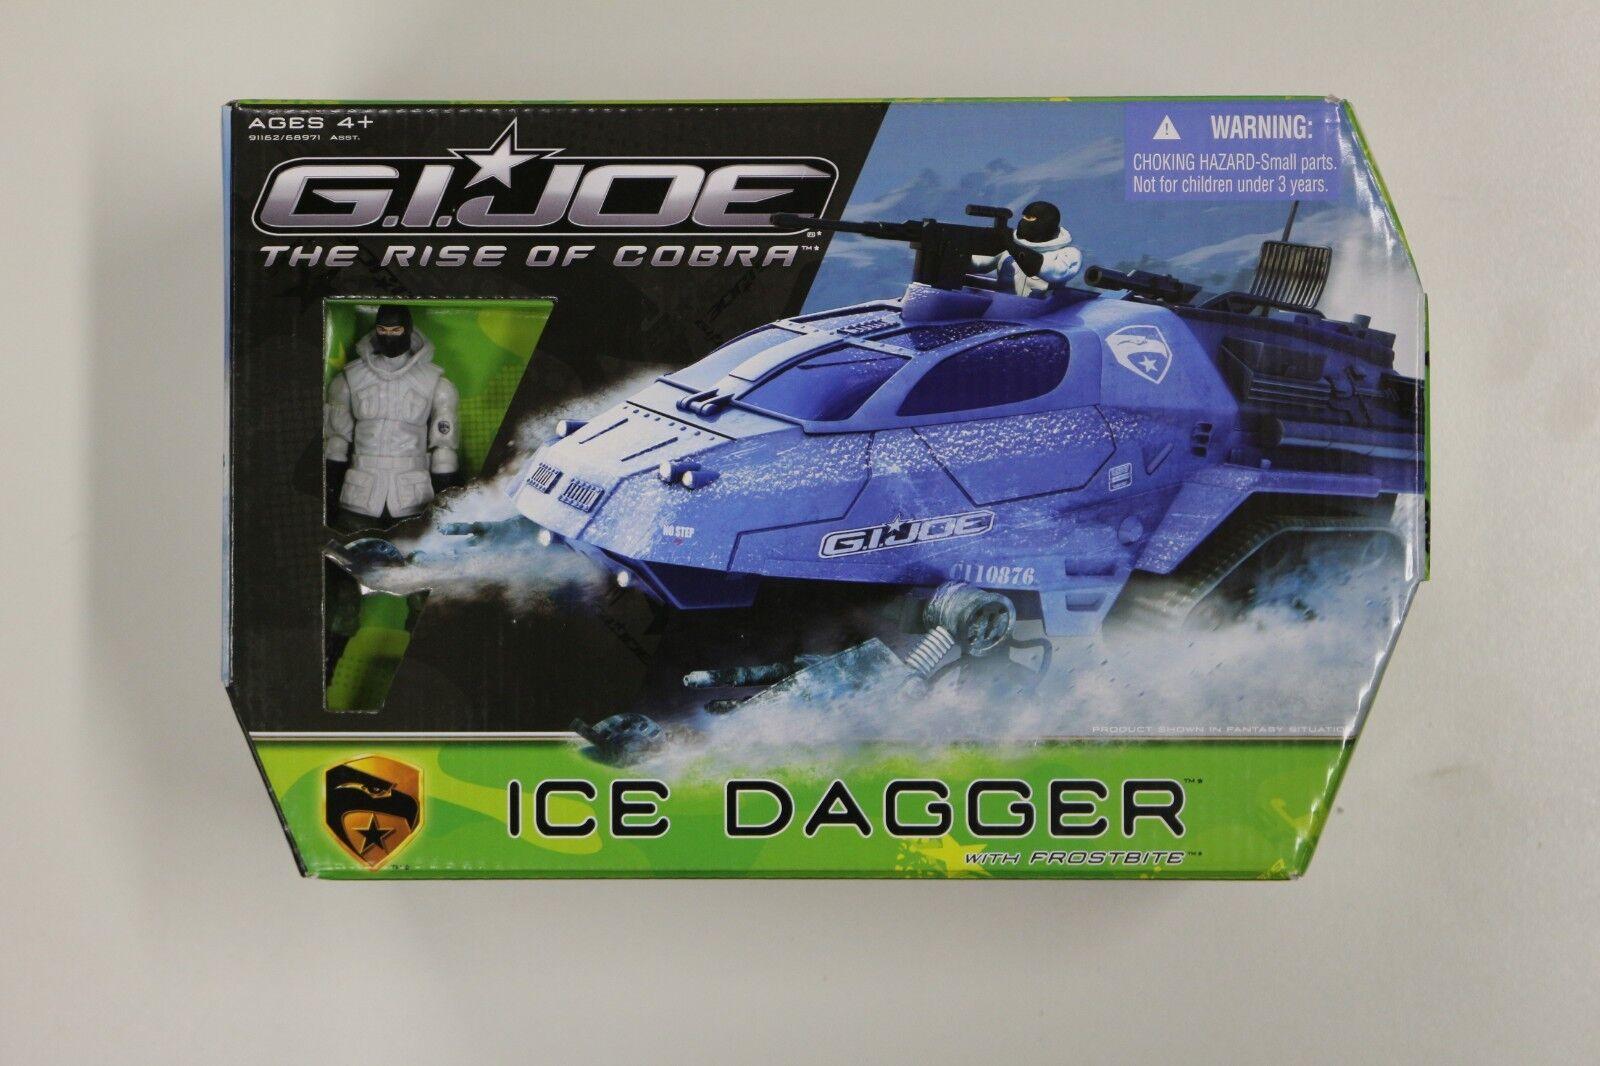 G.I. Joe Ice Dagger with Frostbite Rise of Cobra Movie Vehicle